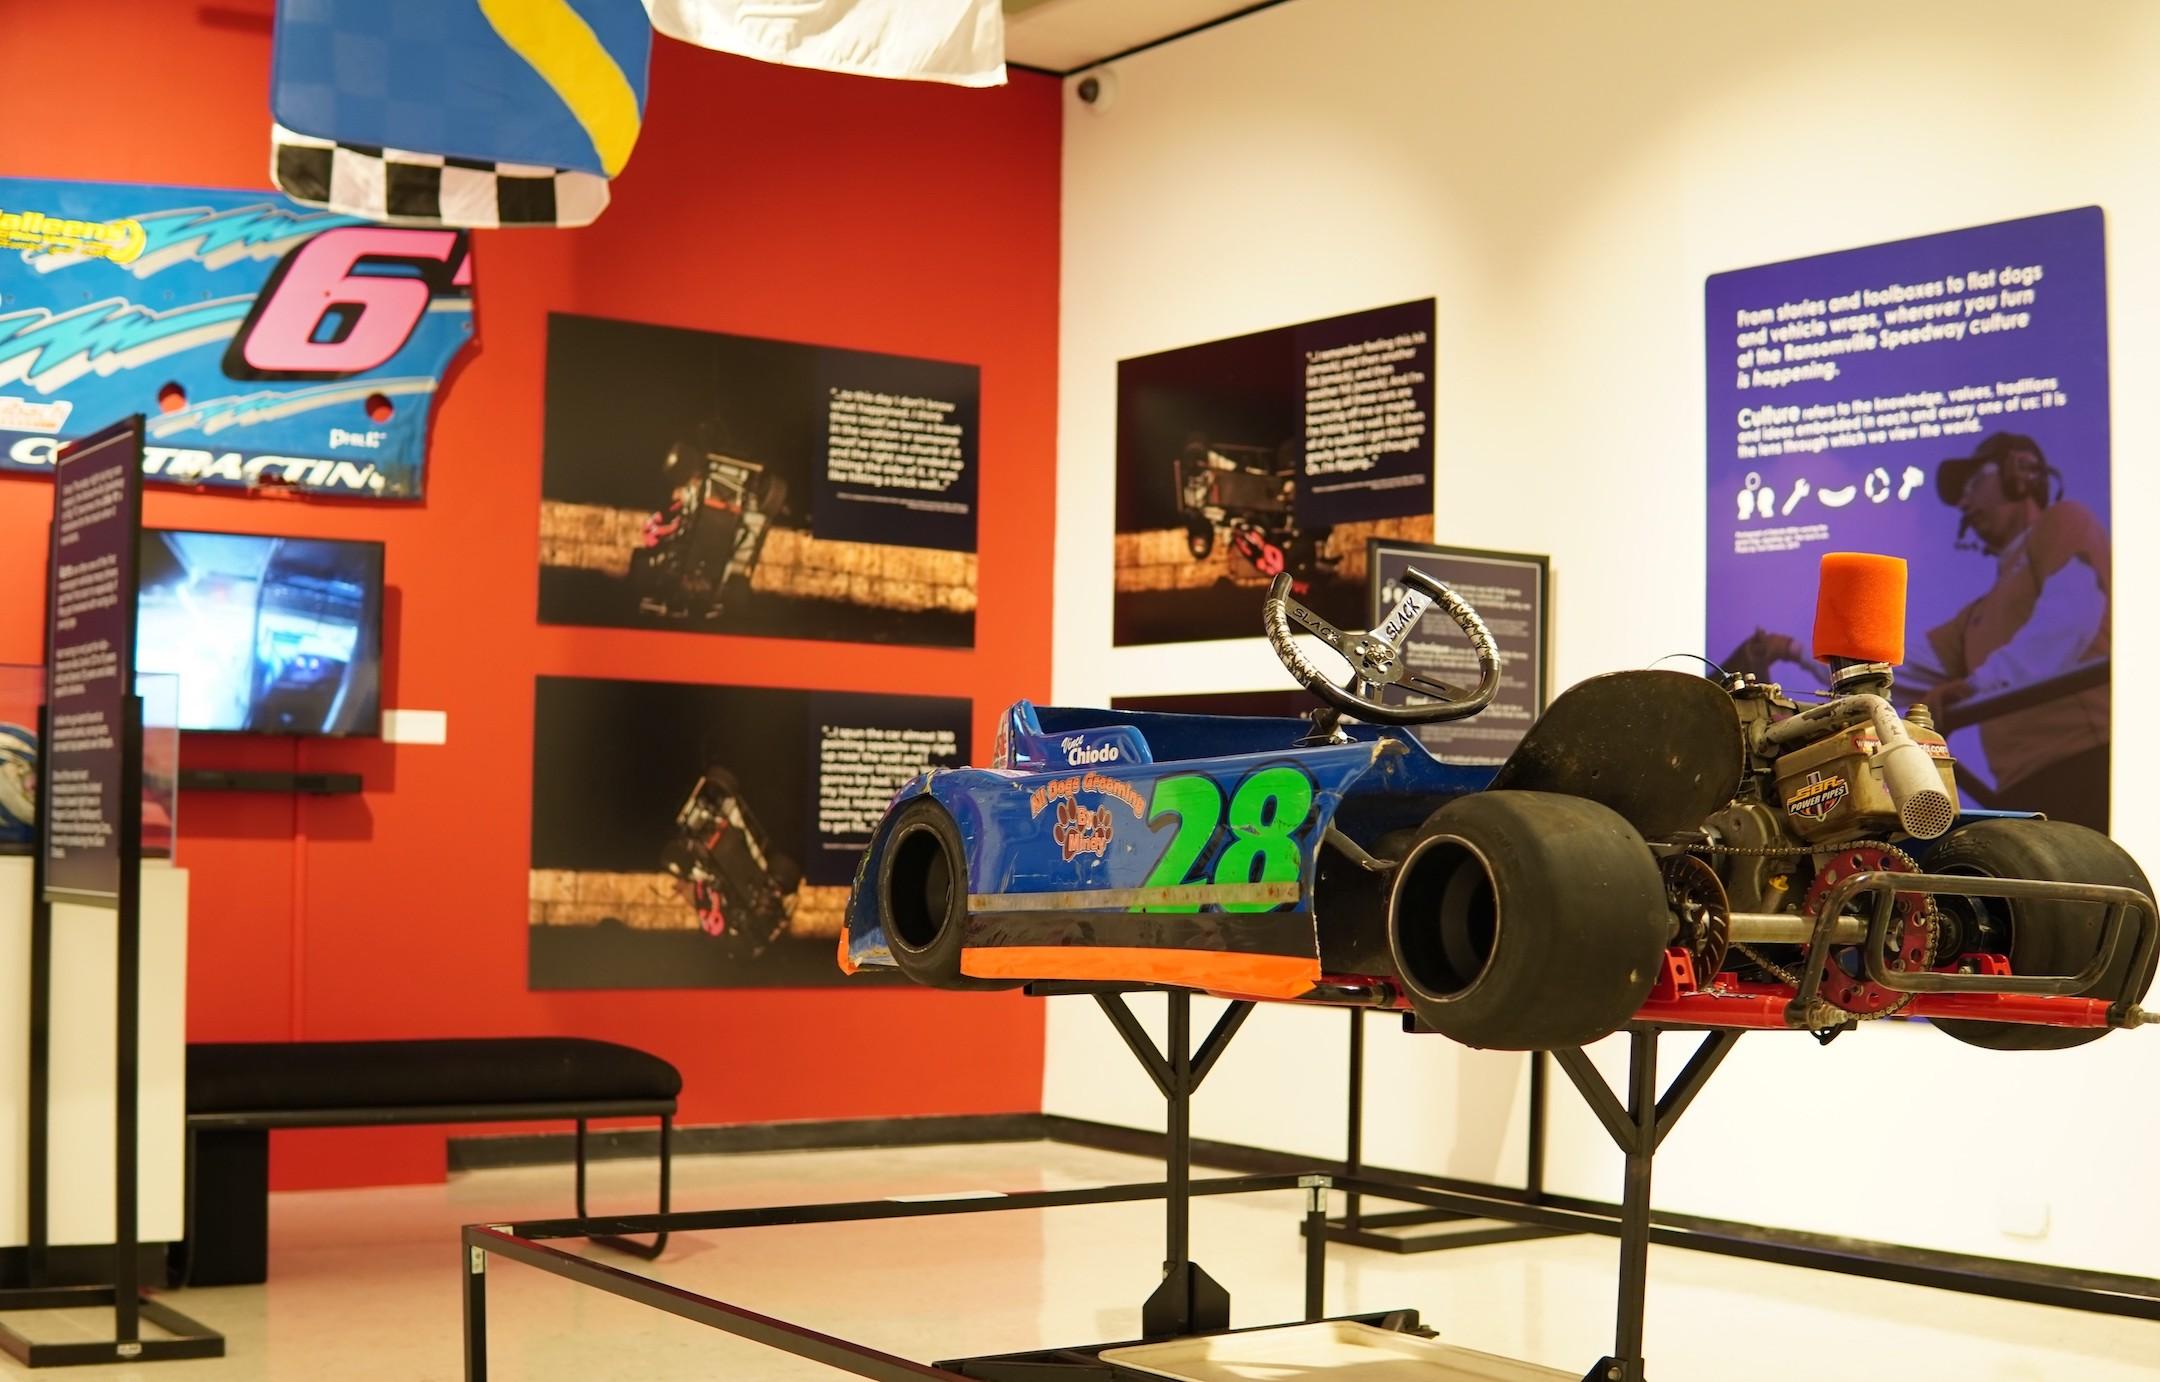 Installation photos of the exhibit courtesy of the Castellani Art Museum of Niagara University.